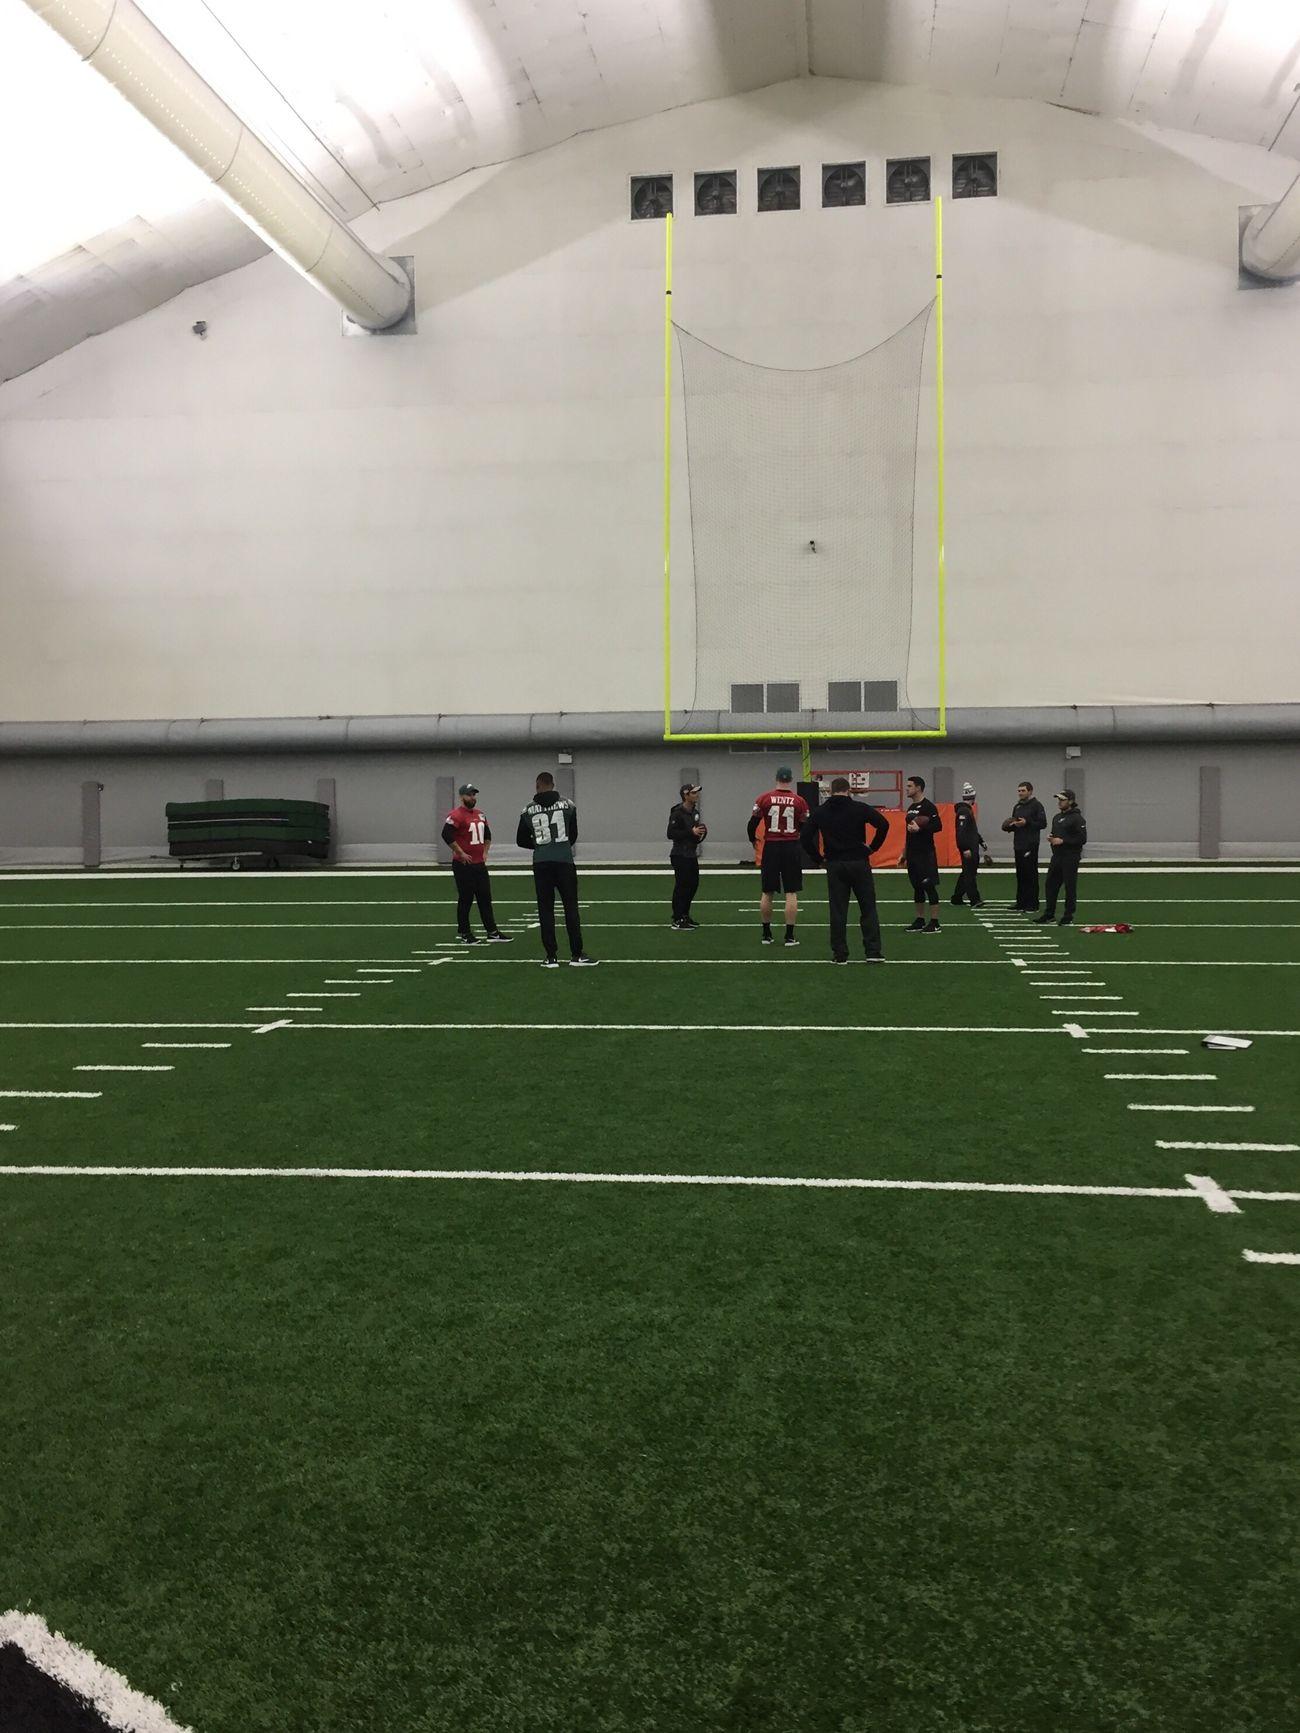 Philadelphia Eagles Carsonwentz practice NFL Football